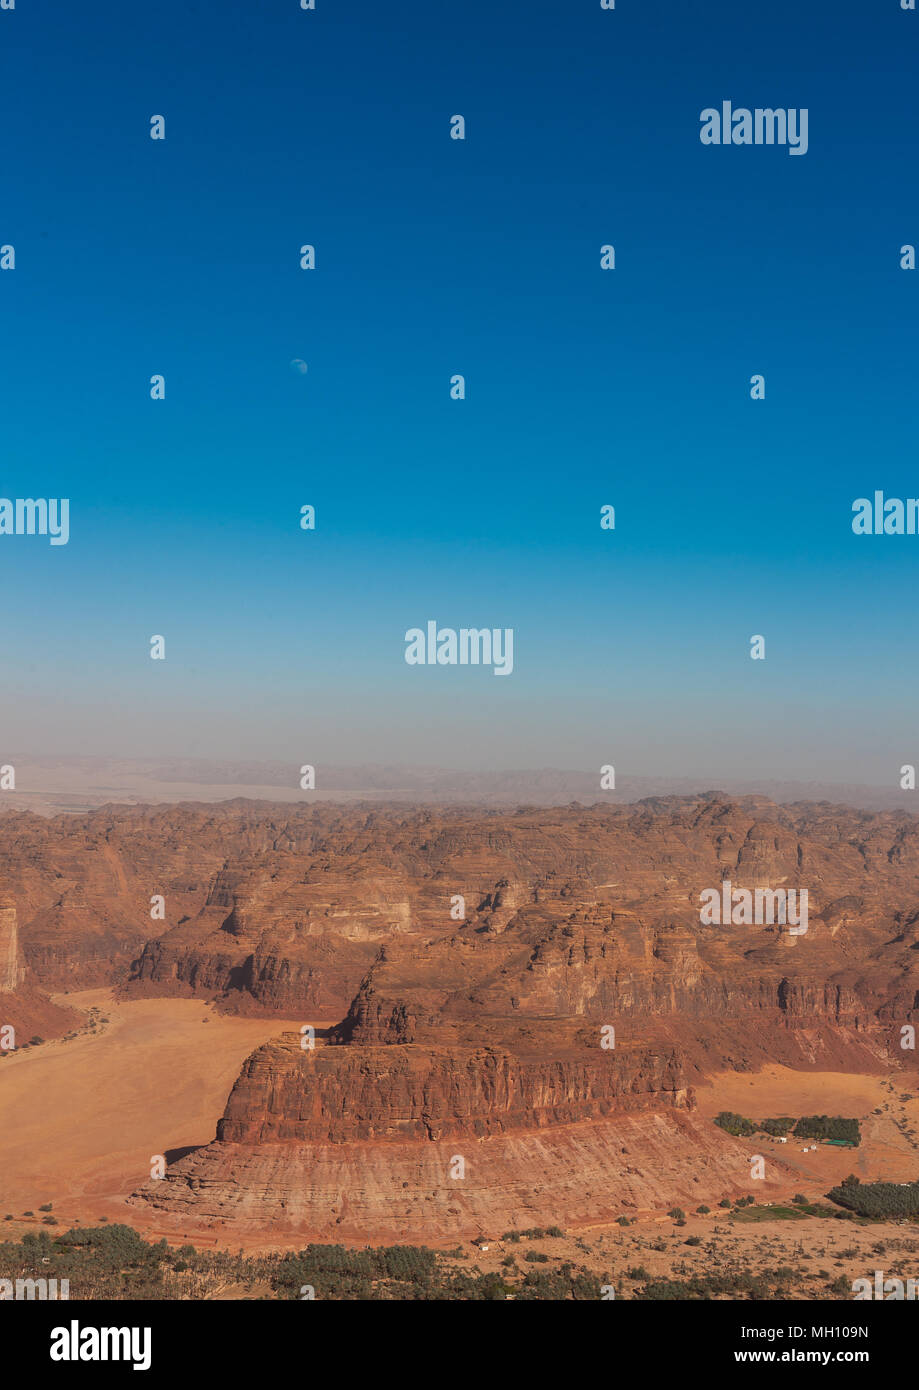 Elevated view of al-ula landscape, Al Madinah Province, Al-Ula, Saudi Arabia - Stock Image